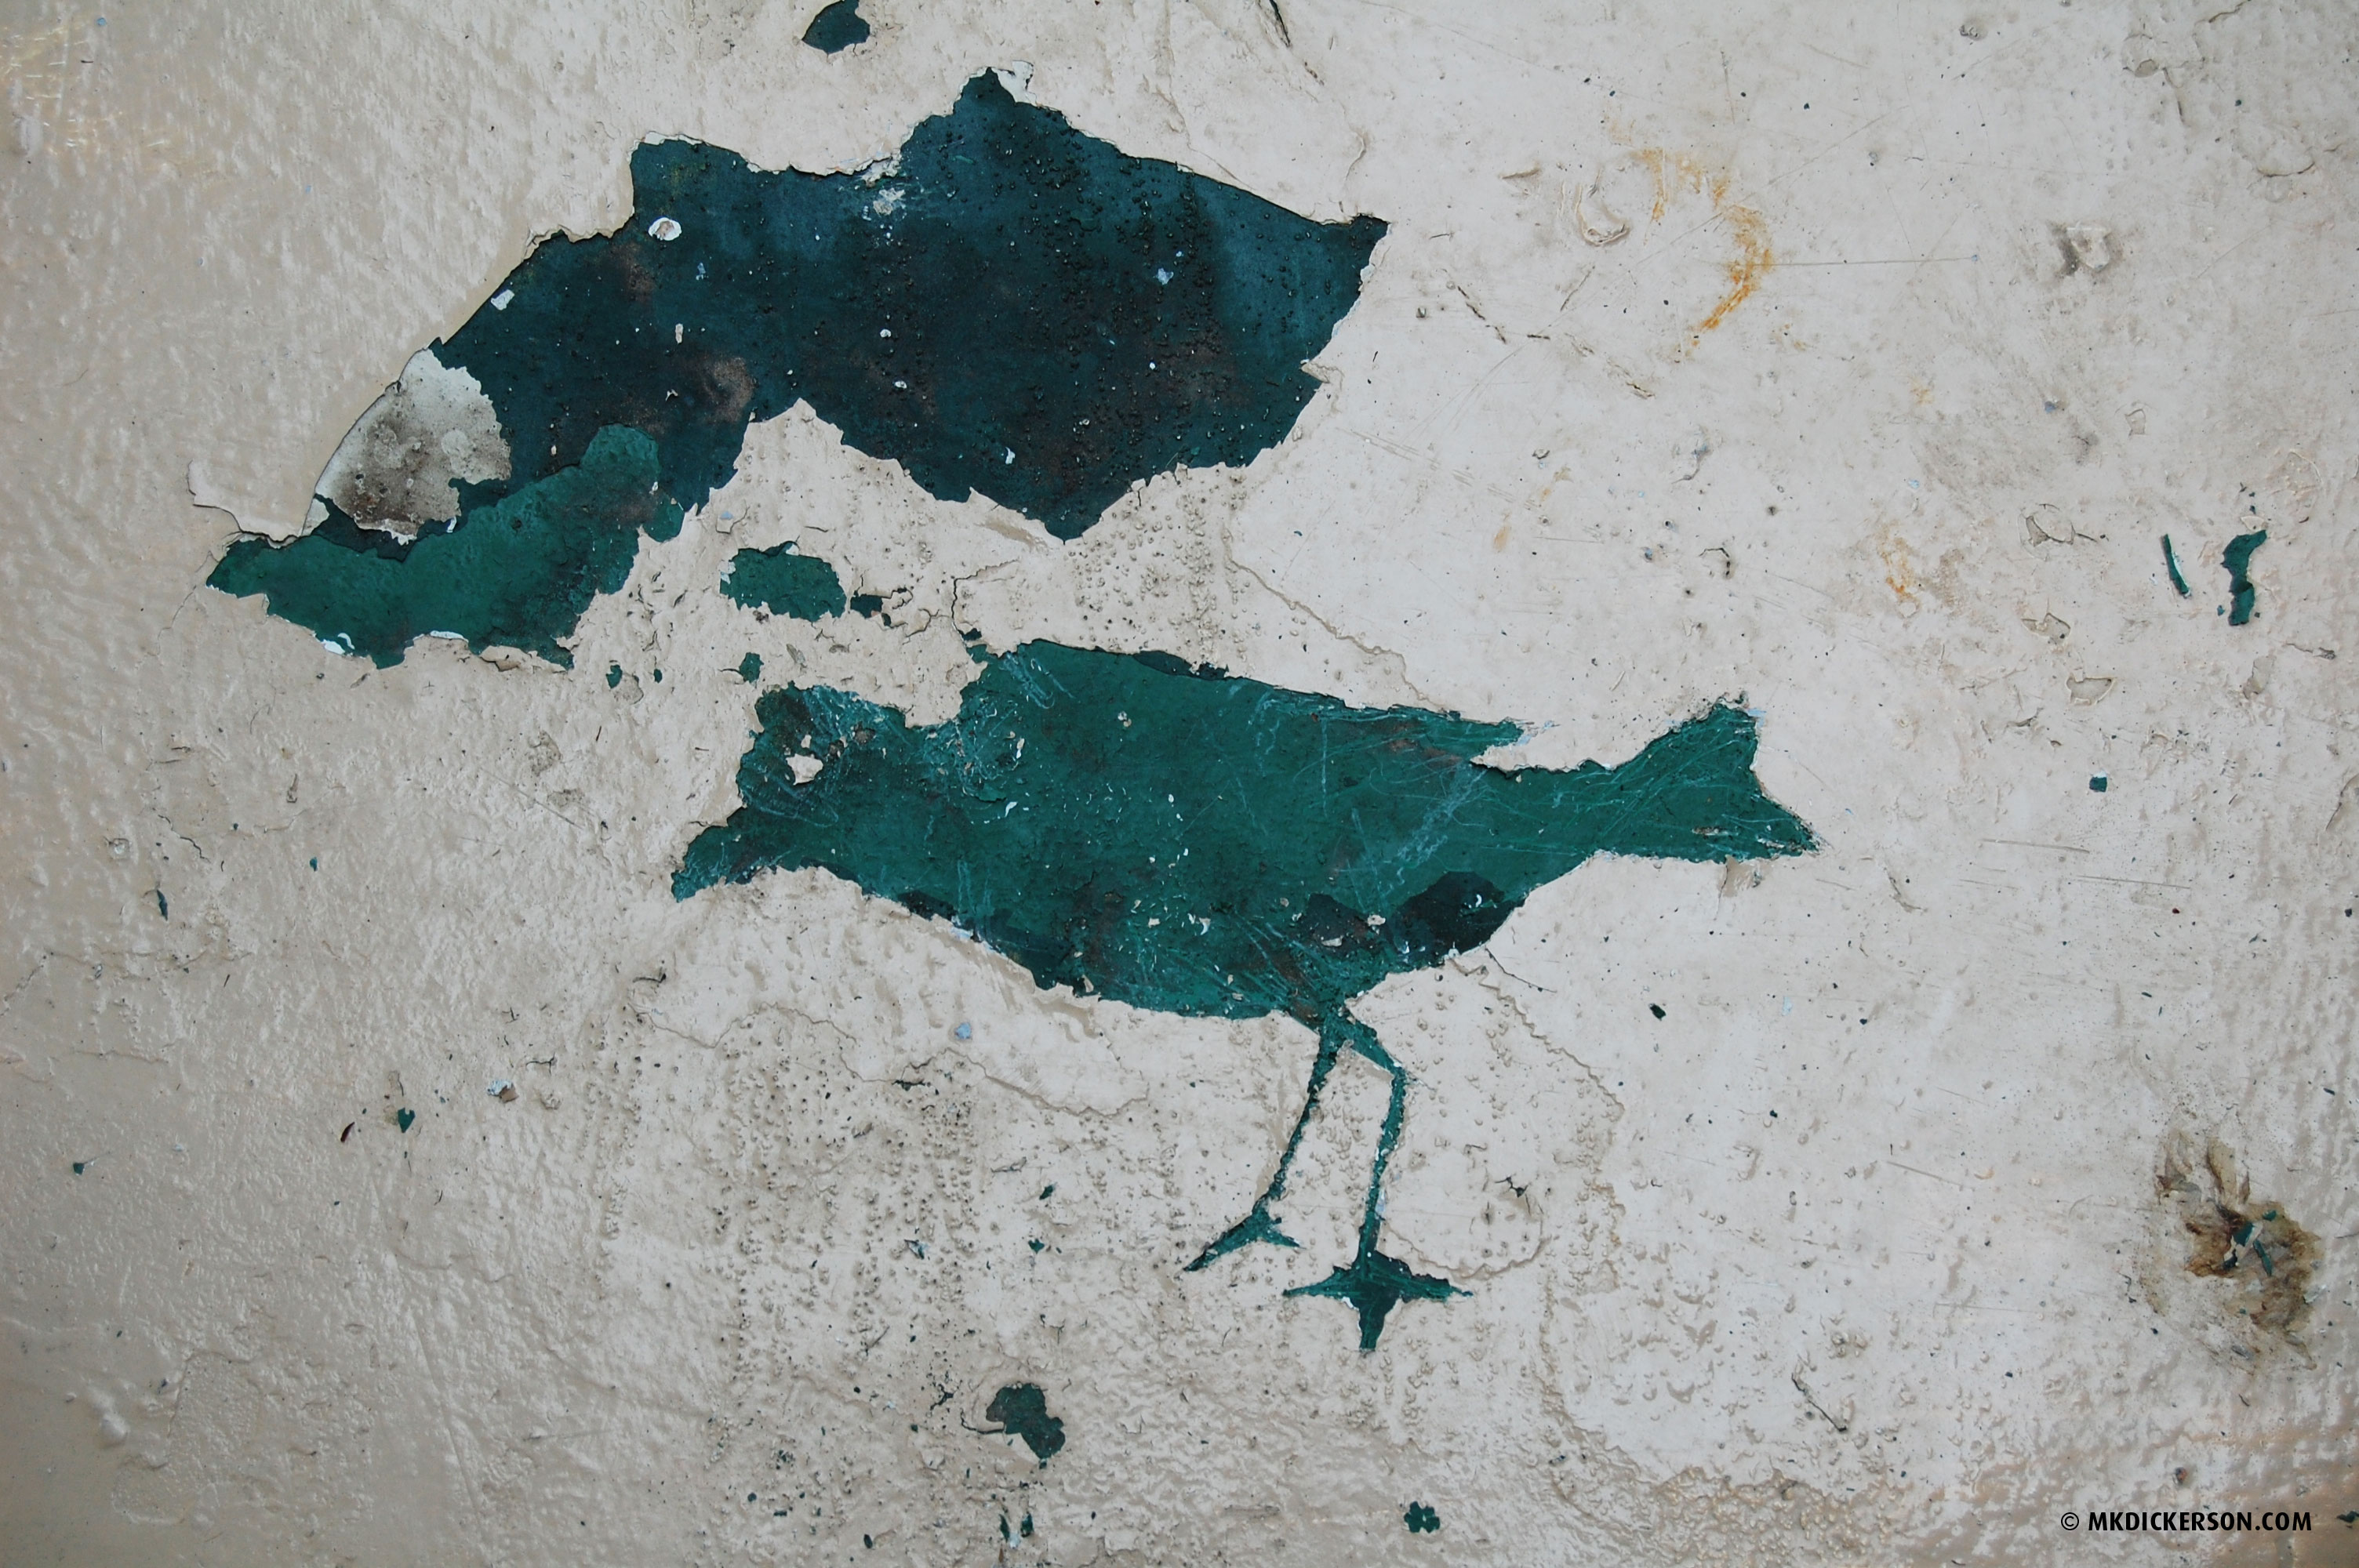 Day 152. Peeling Paint Bird | Bird-A-Day Art